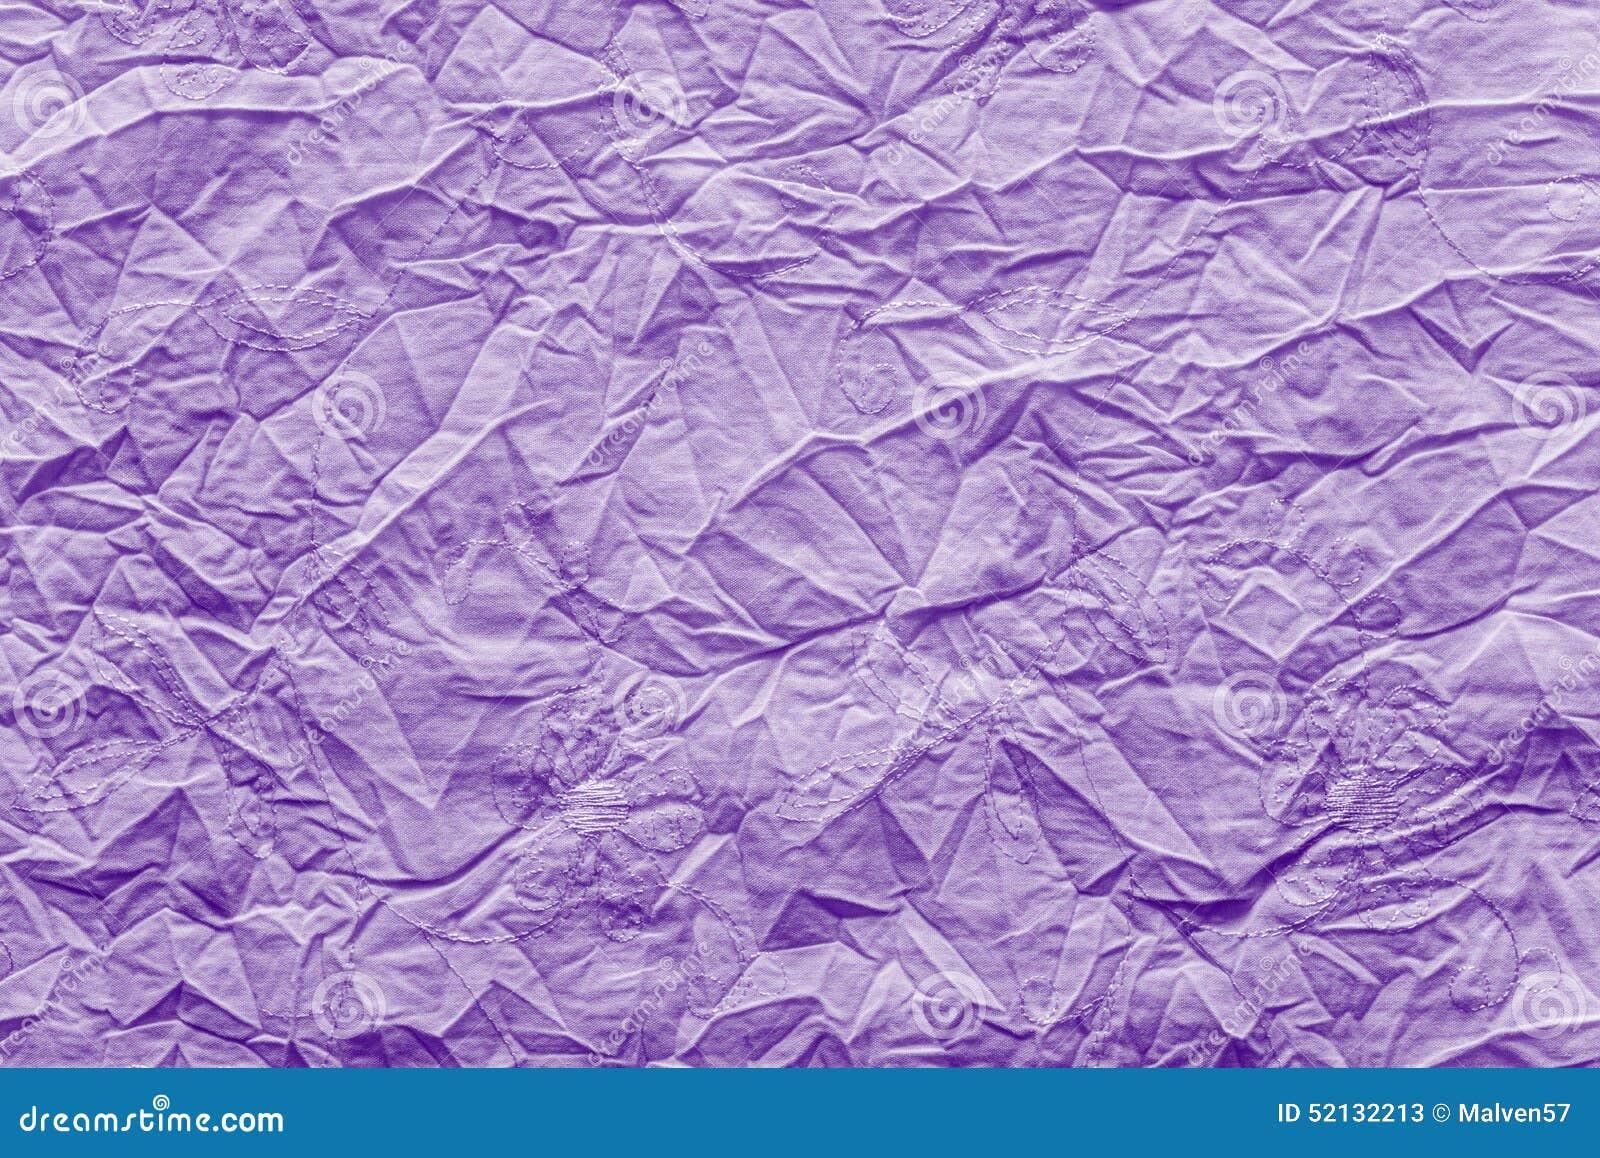 tissu chiffonn de texture de couleur lilas lumineuse photo stock image 52132213. Black Bedroom Furniture Sets. Home Design Ideas